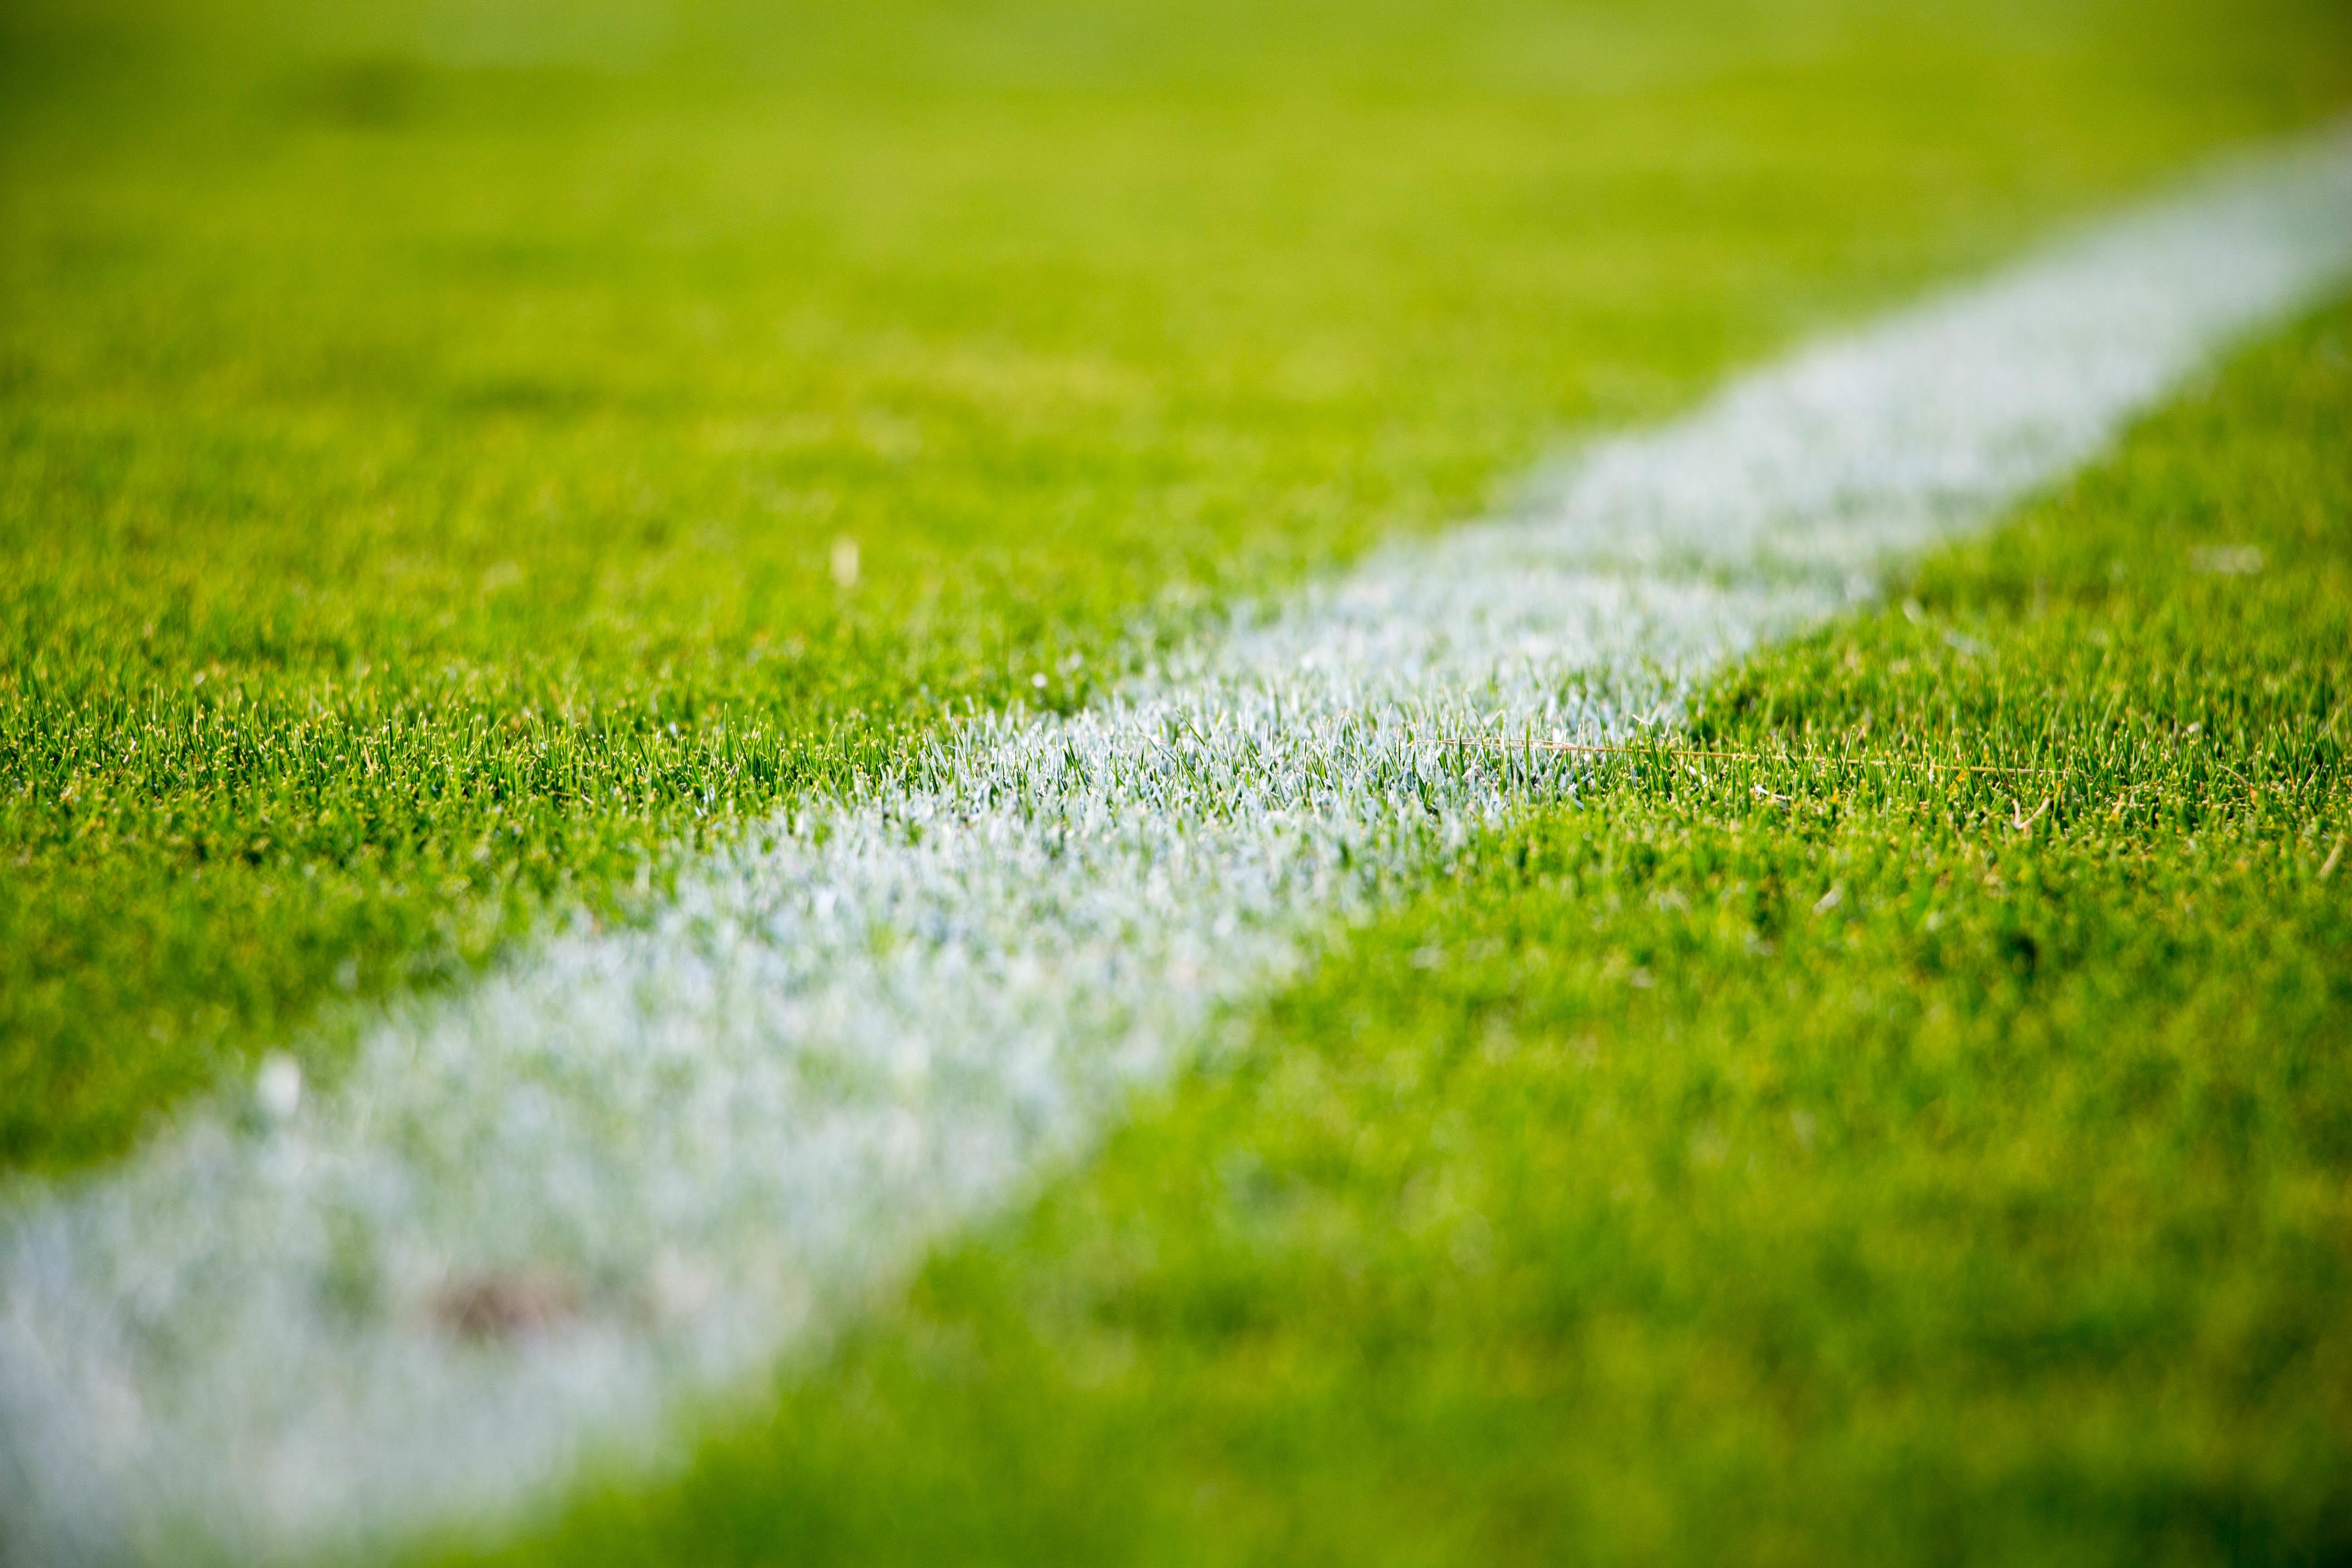 Wallpaper Soccer ball Field Grass Lawn HD Picture Image